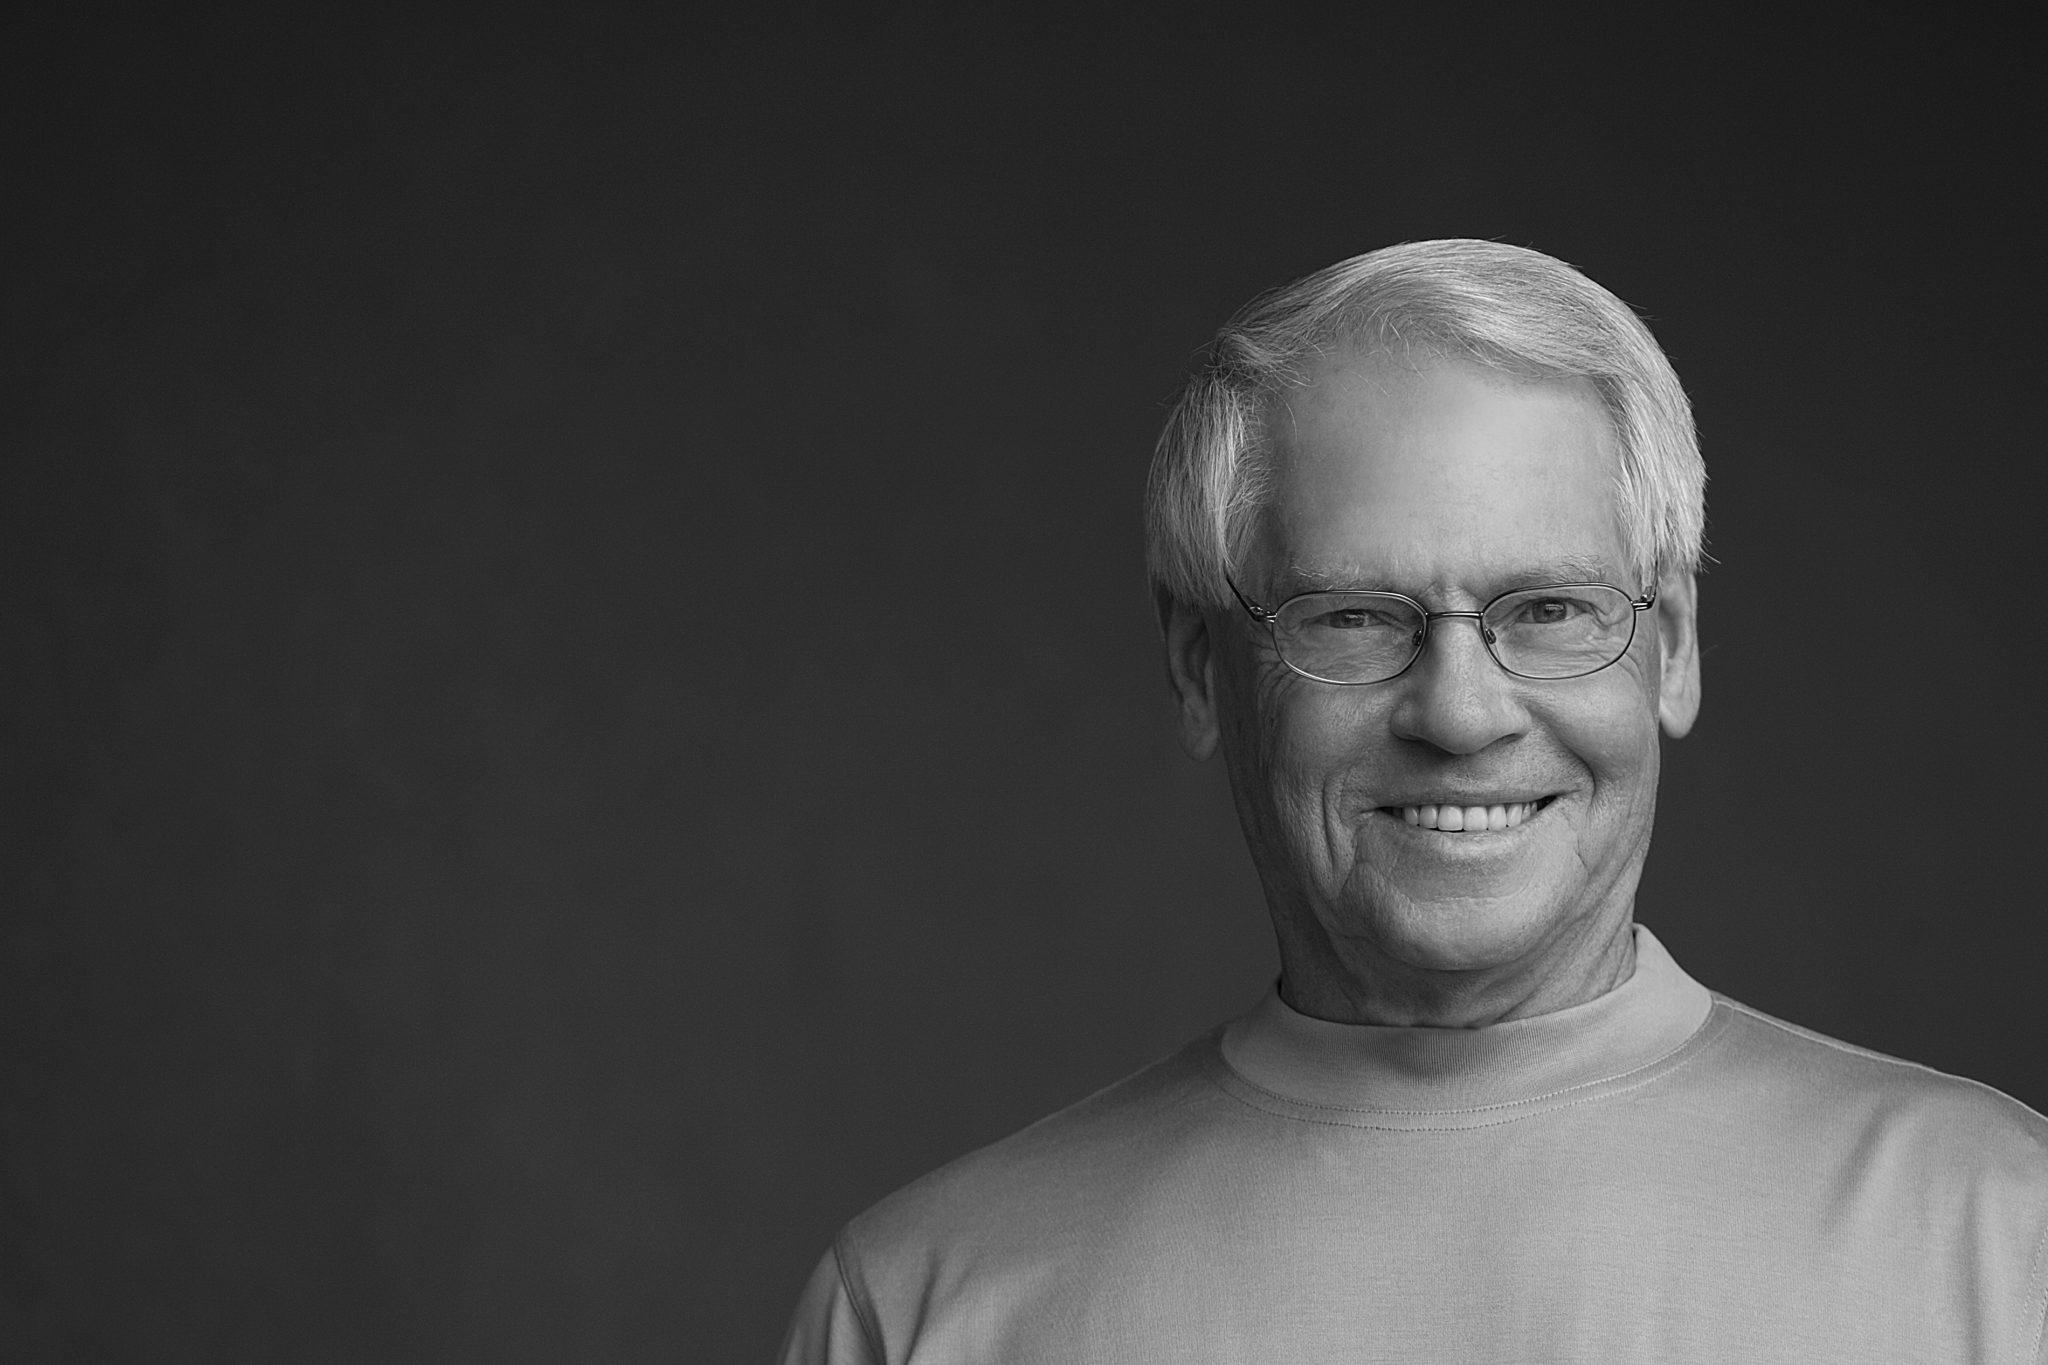 Founding Board Chair Milt Walker Retires from The Reach Board